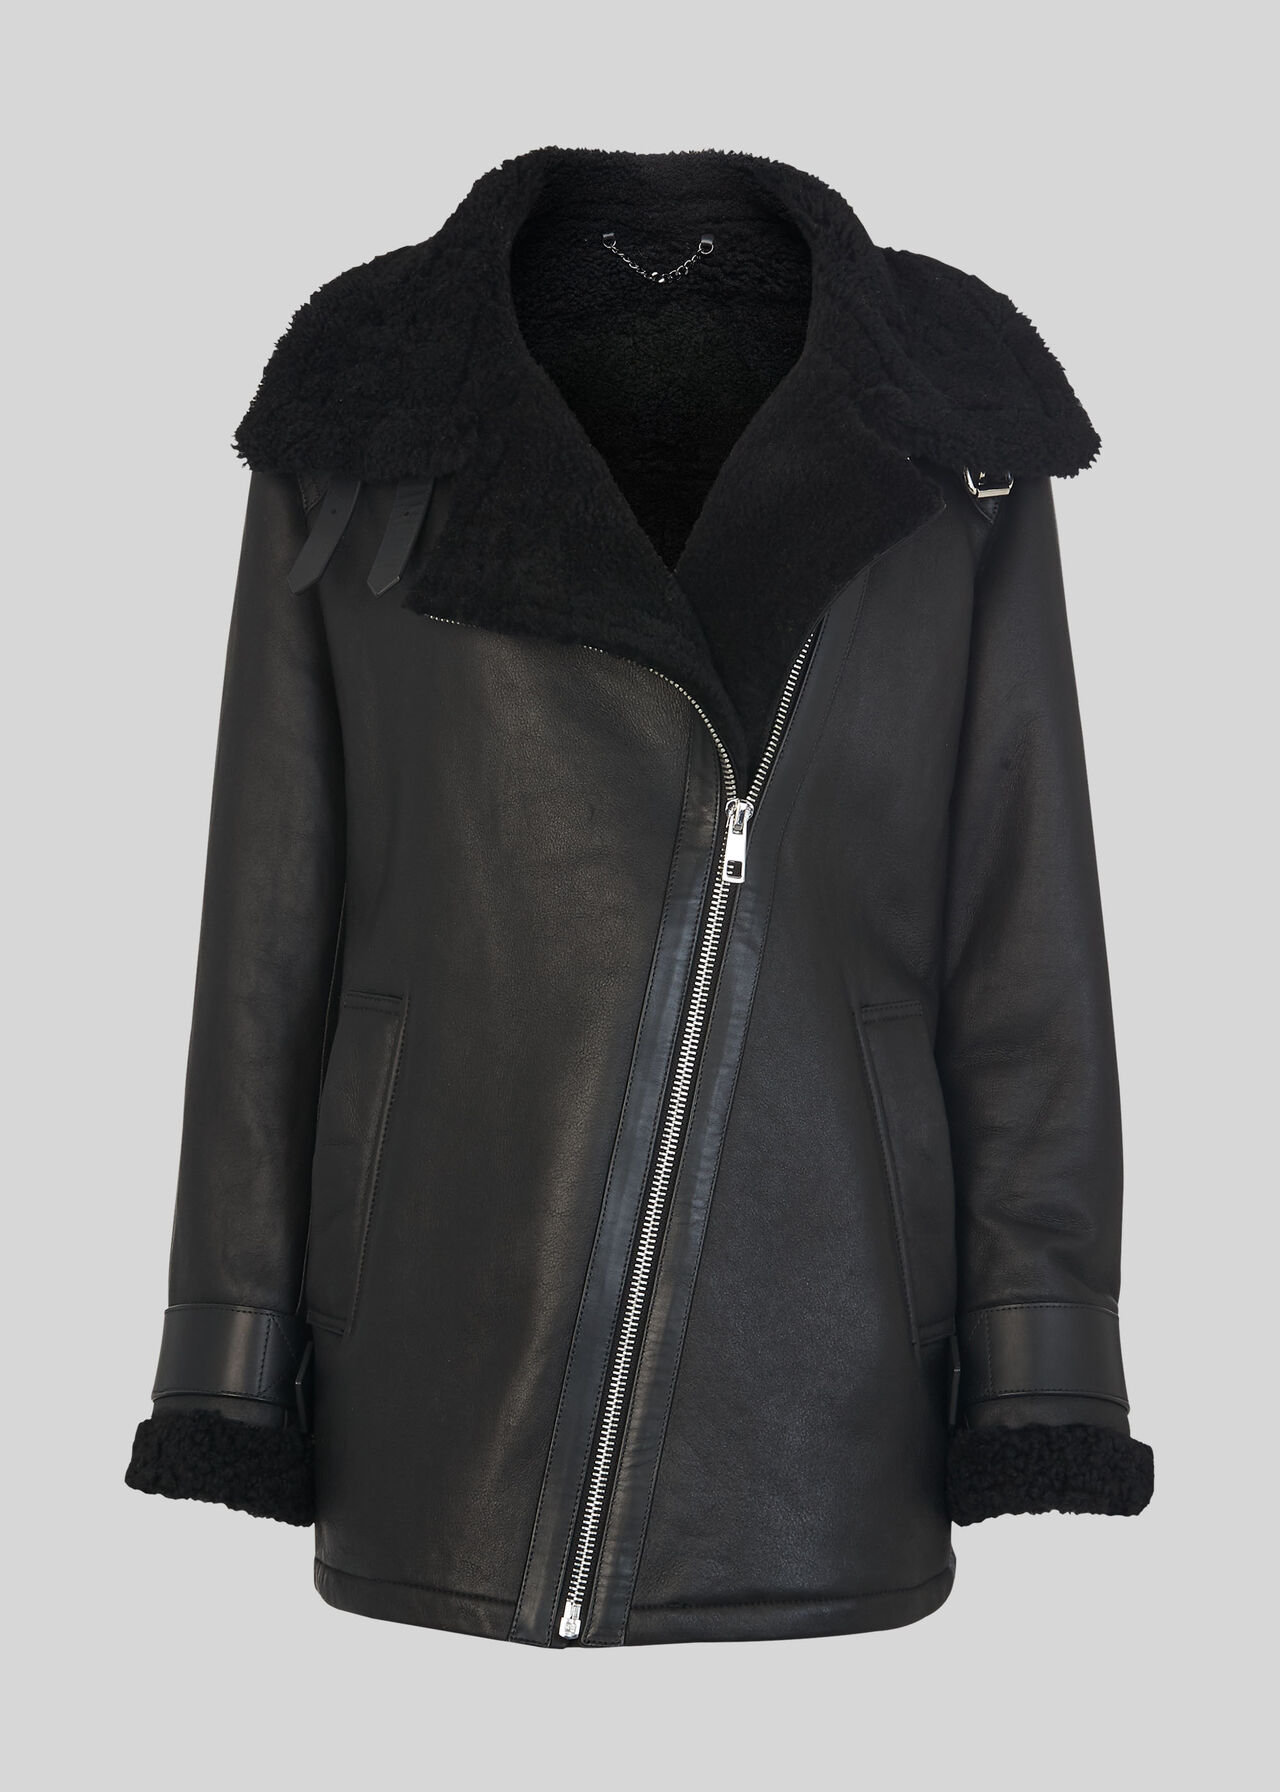 Shearling Brianna Biker Jacket Black